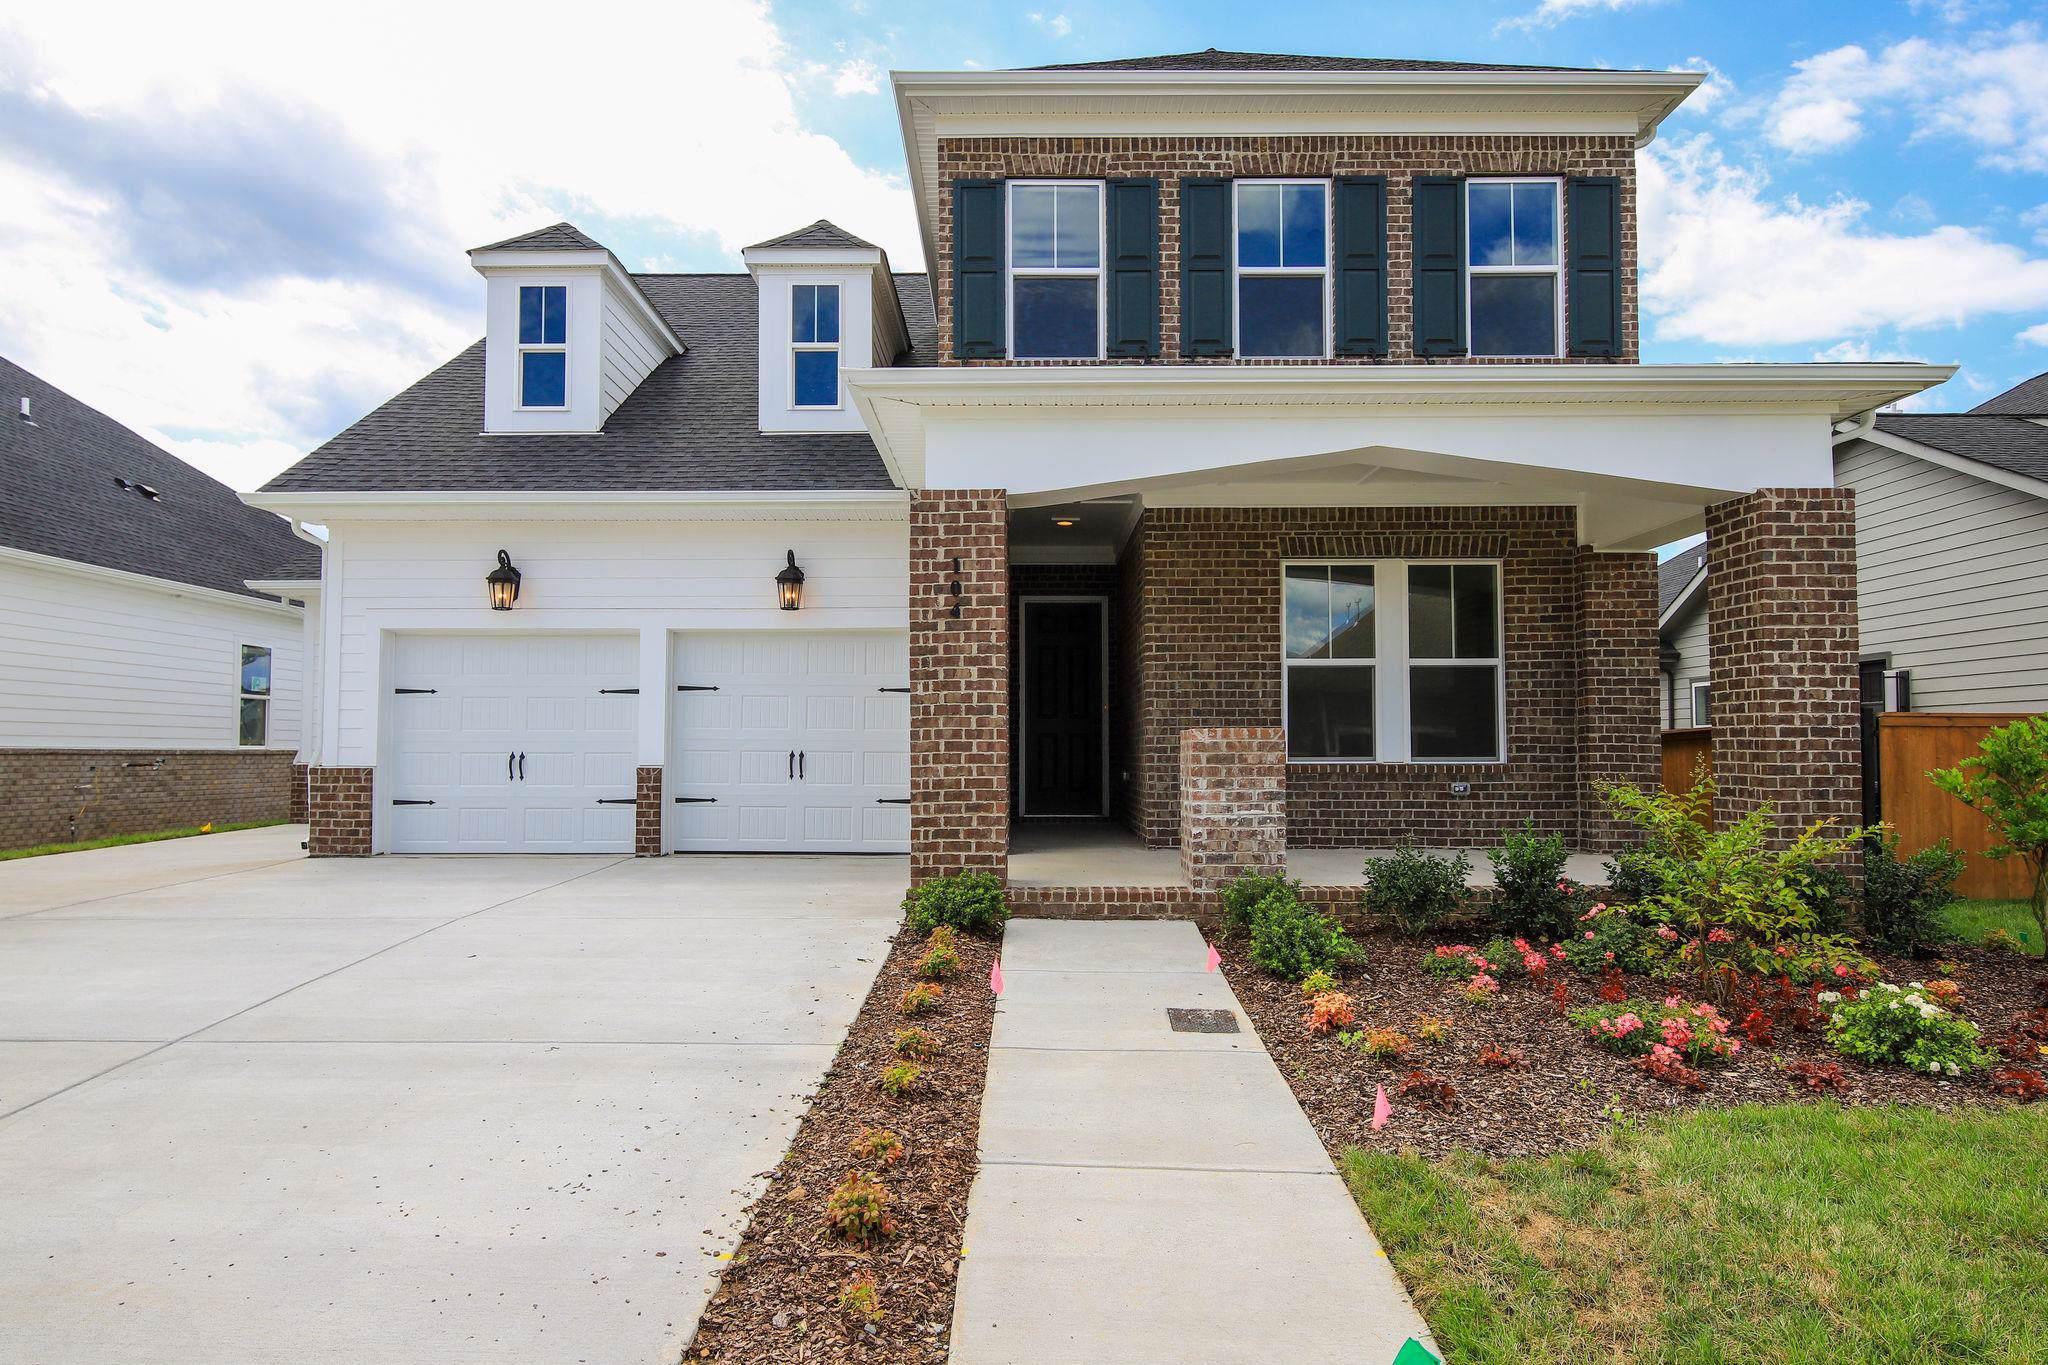 104 Misty Way  #304, Hendersonville, TN 37075 (MLS #RTC2074982) :: Berkshire Hathaway HomeServices Woodmont Realty